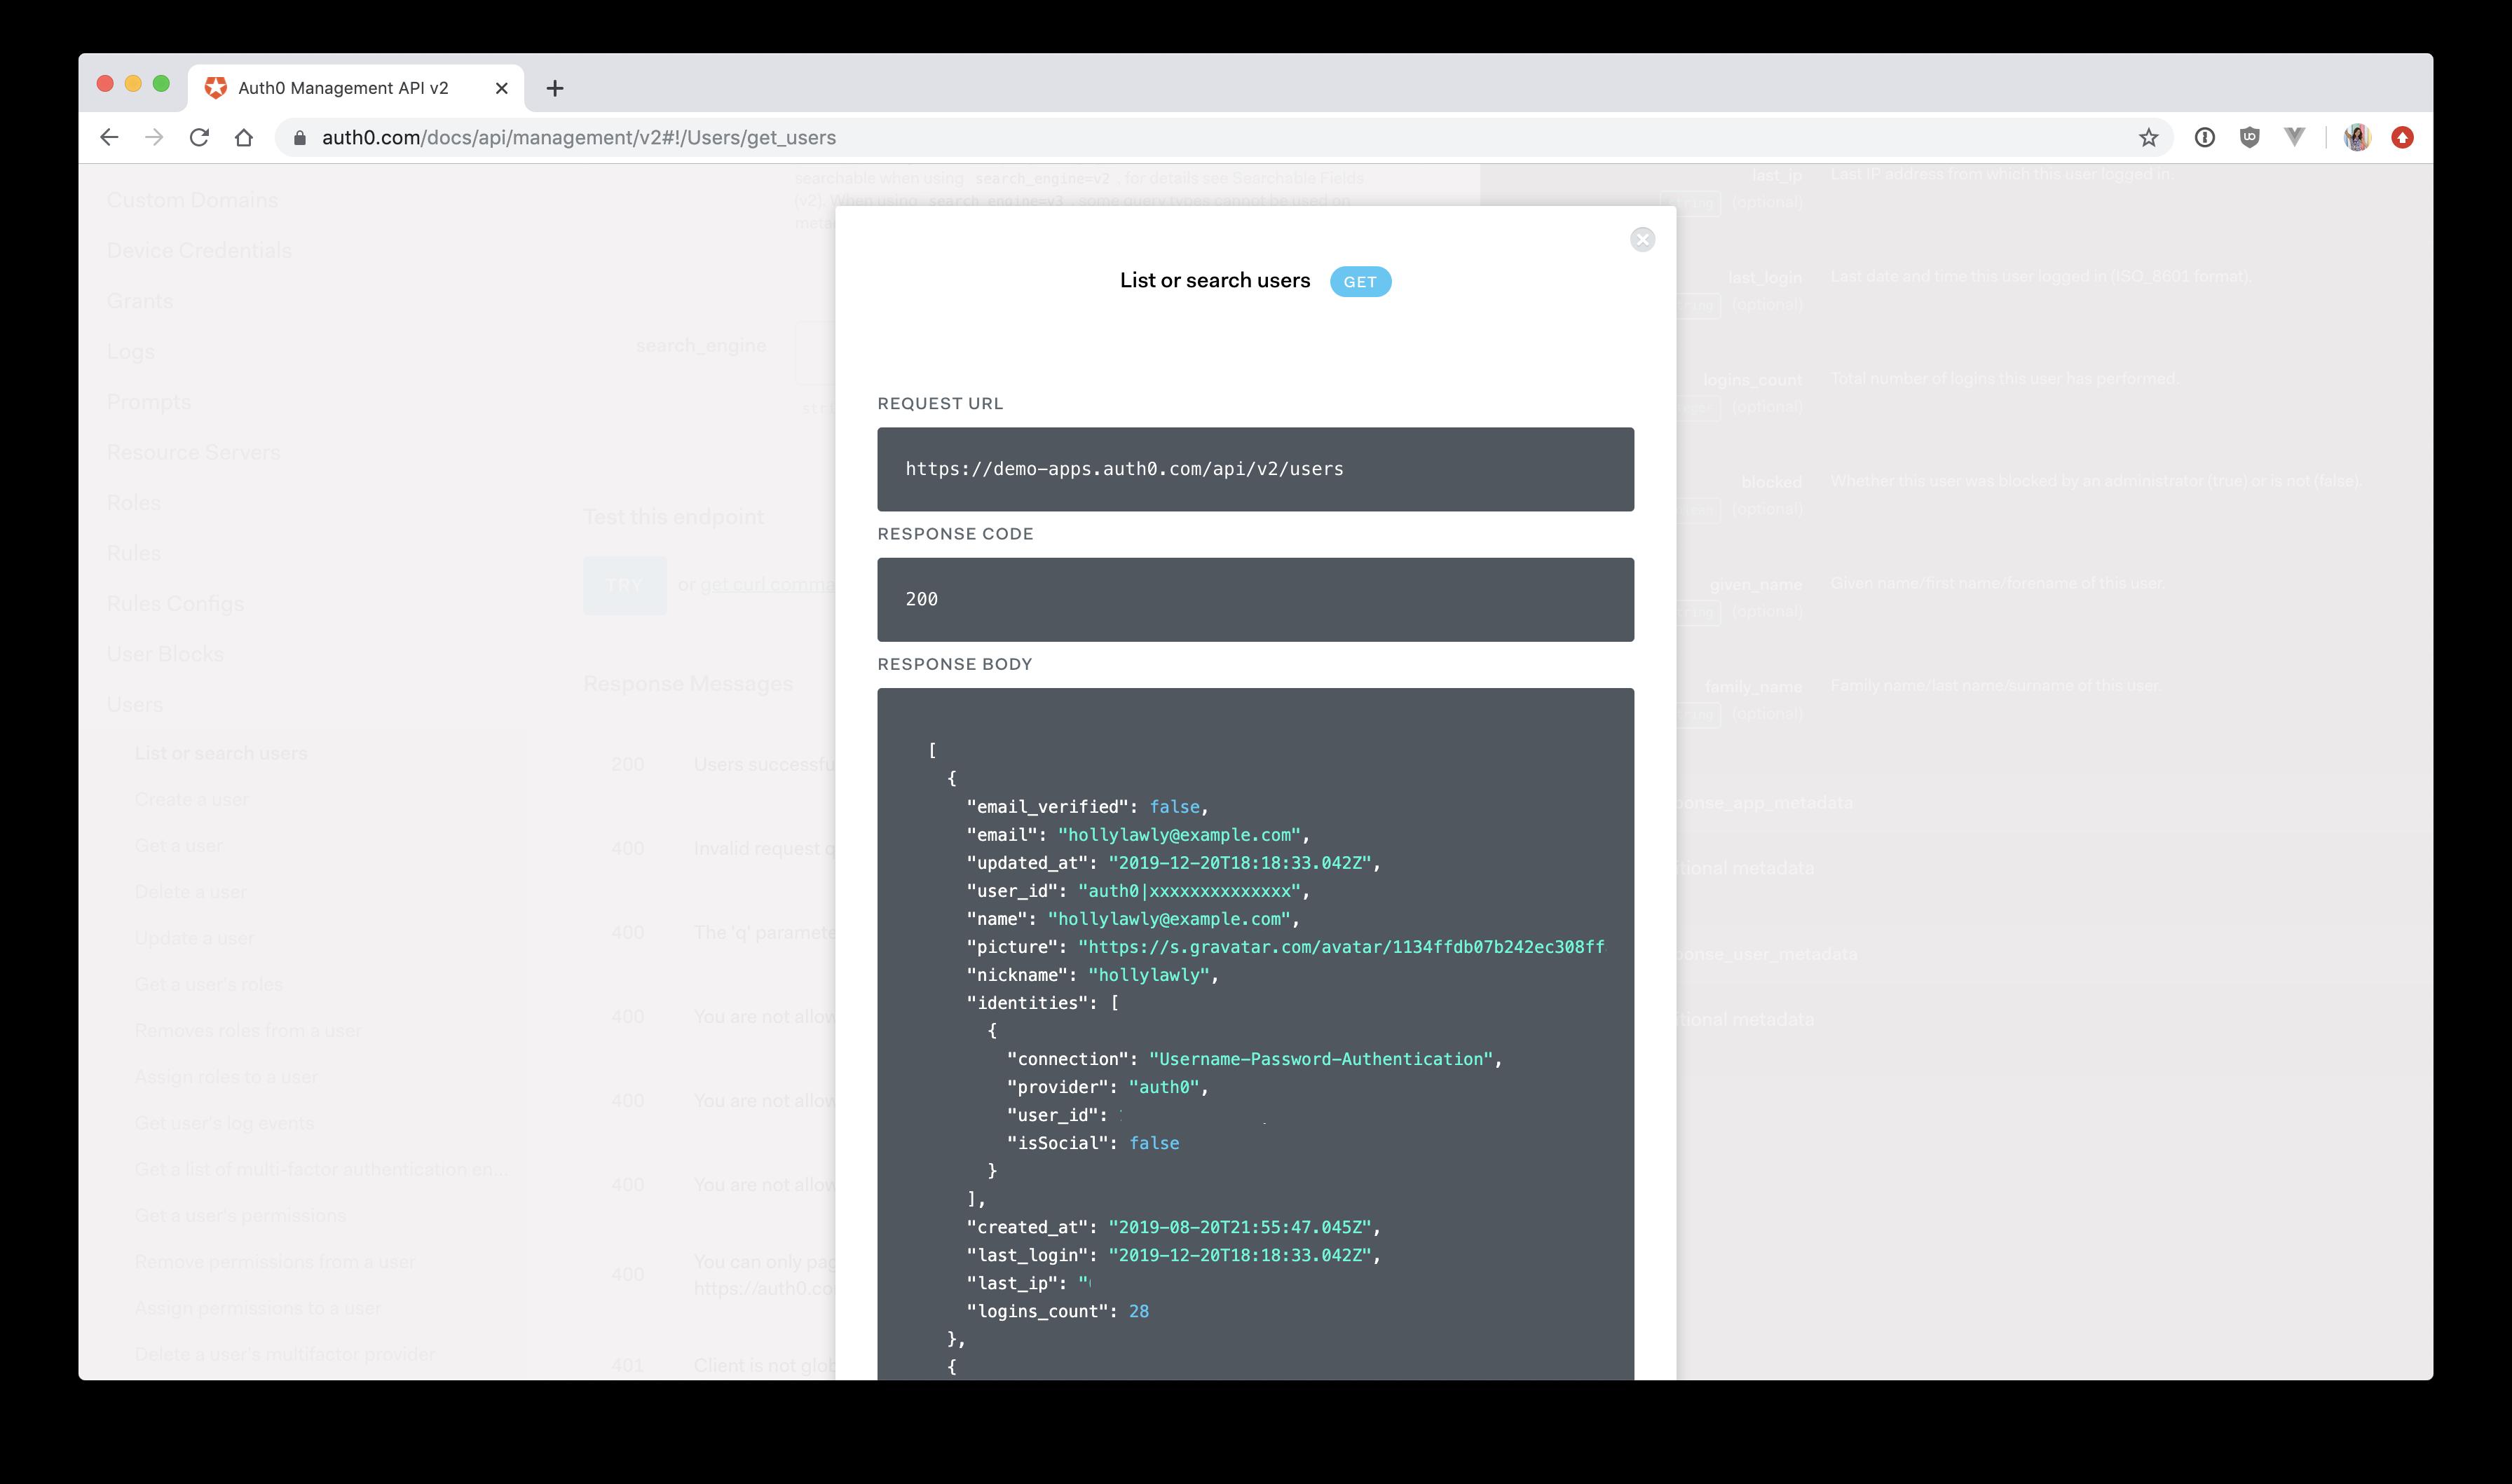 Auth0 management API explorer - get all users